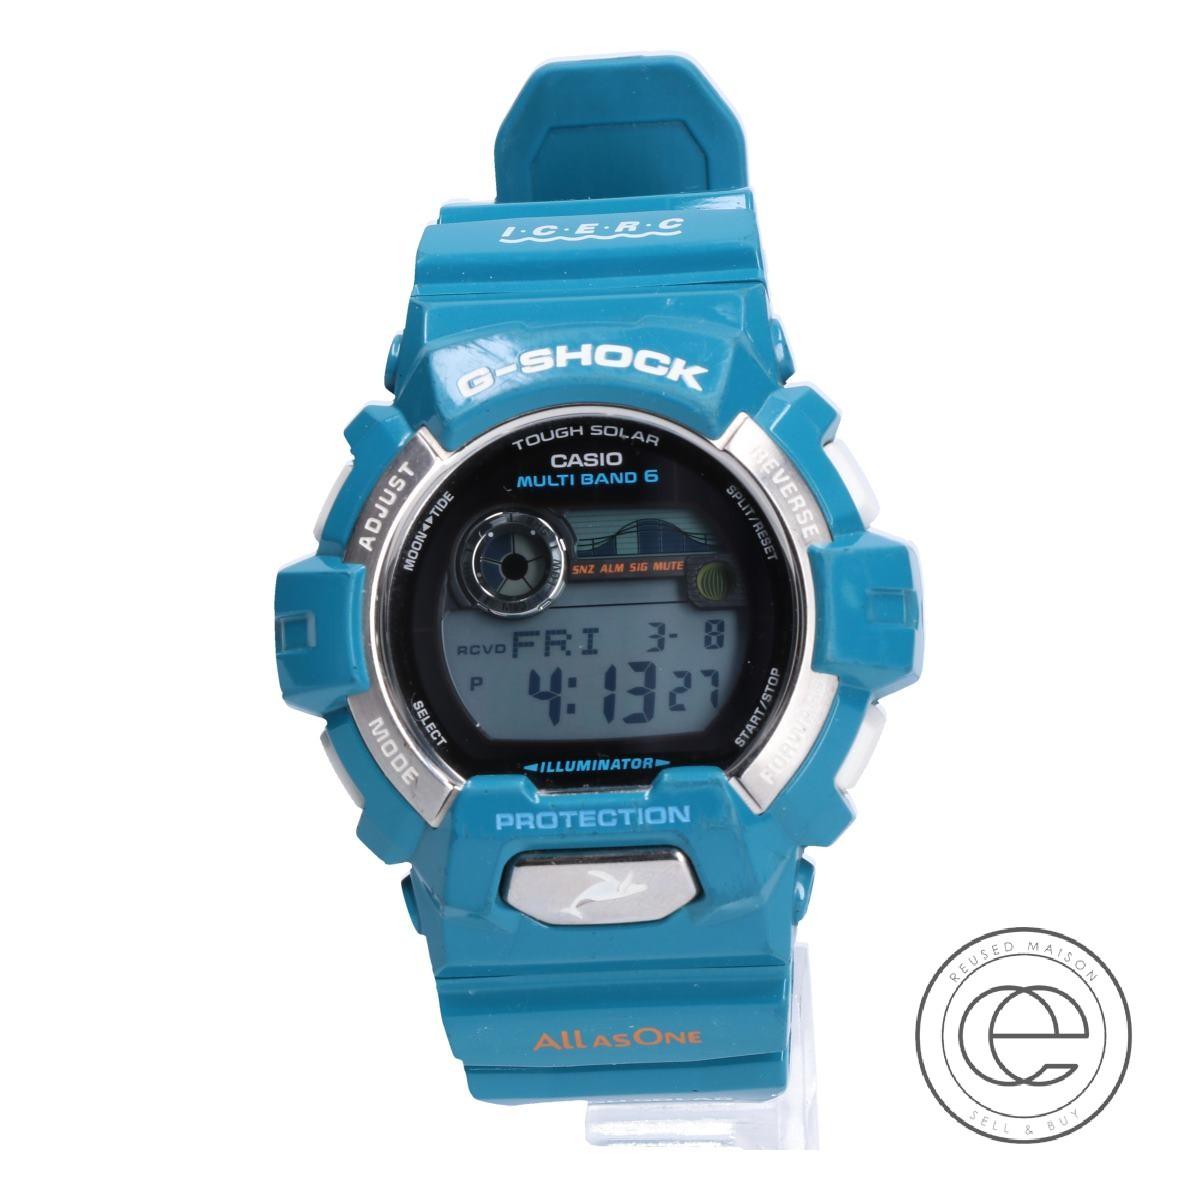 G-SHOCKジーショック GWX-8900K-3JR 2012年 アイサーチ・ジャパン イルカ・クジラモデル タフソーラー電波 腕時計 ブルーグリーン 【中古】